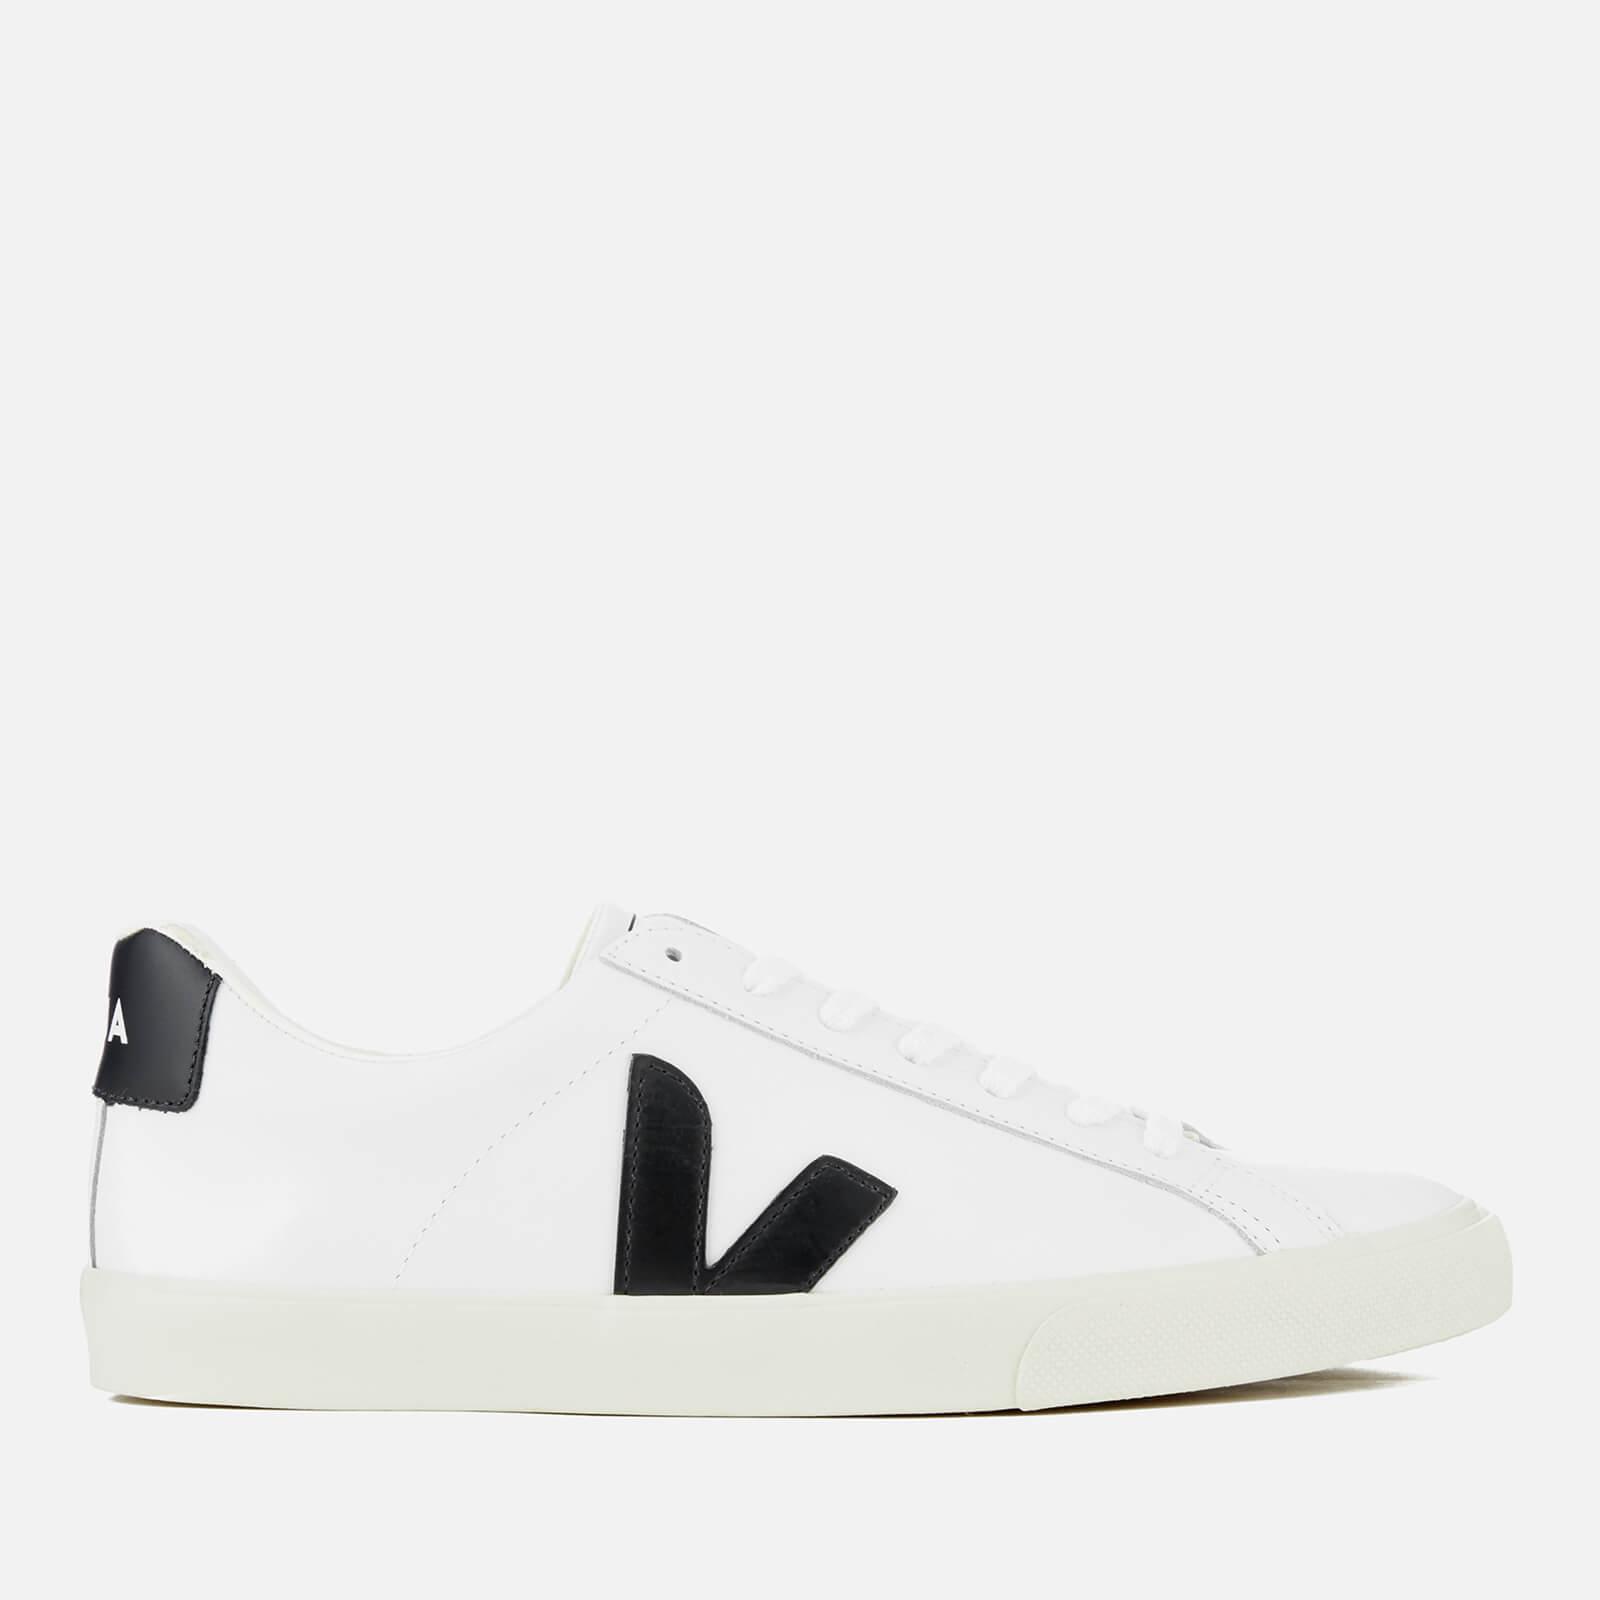 7e9724dabe5f6 Veja Men s Esplar Leather Low Trainers - Extra White Black - Free UK ...